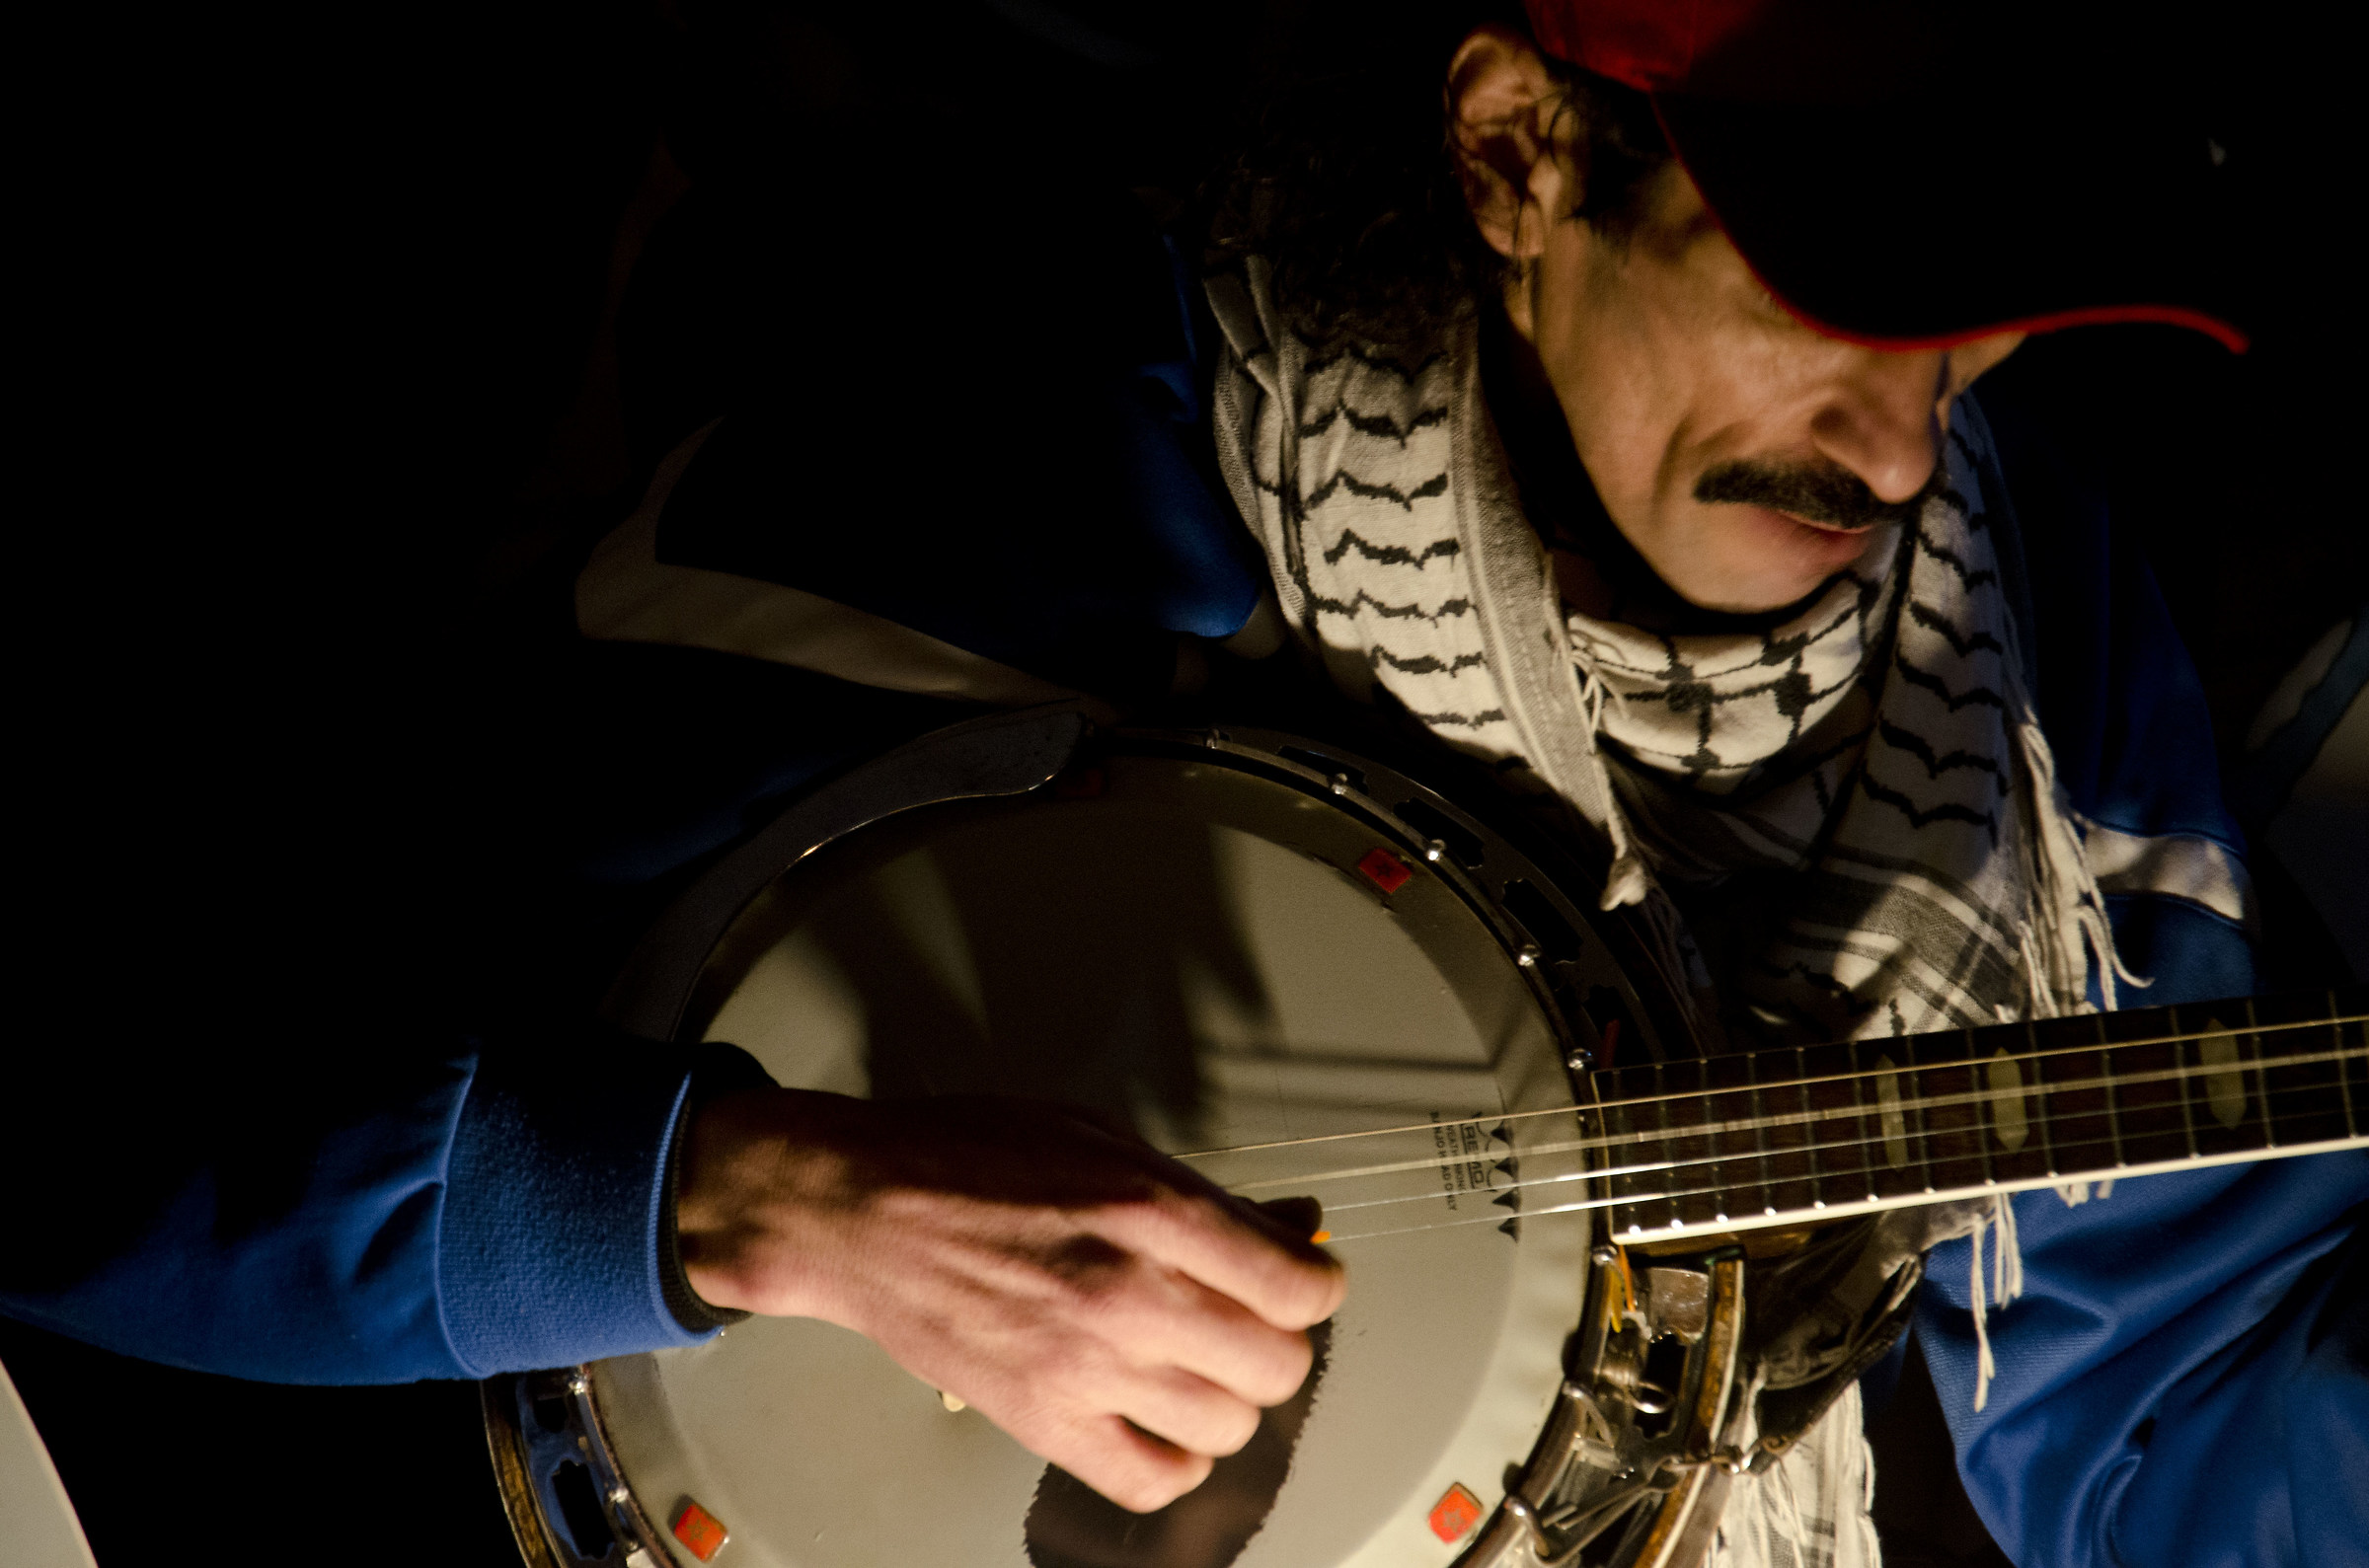 l'uomo ed il banjo...